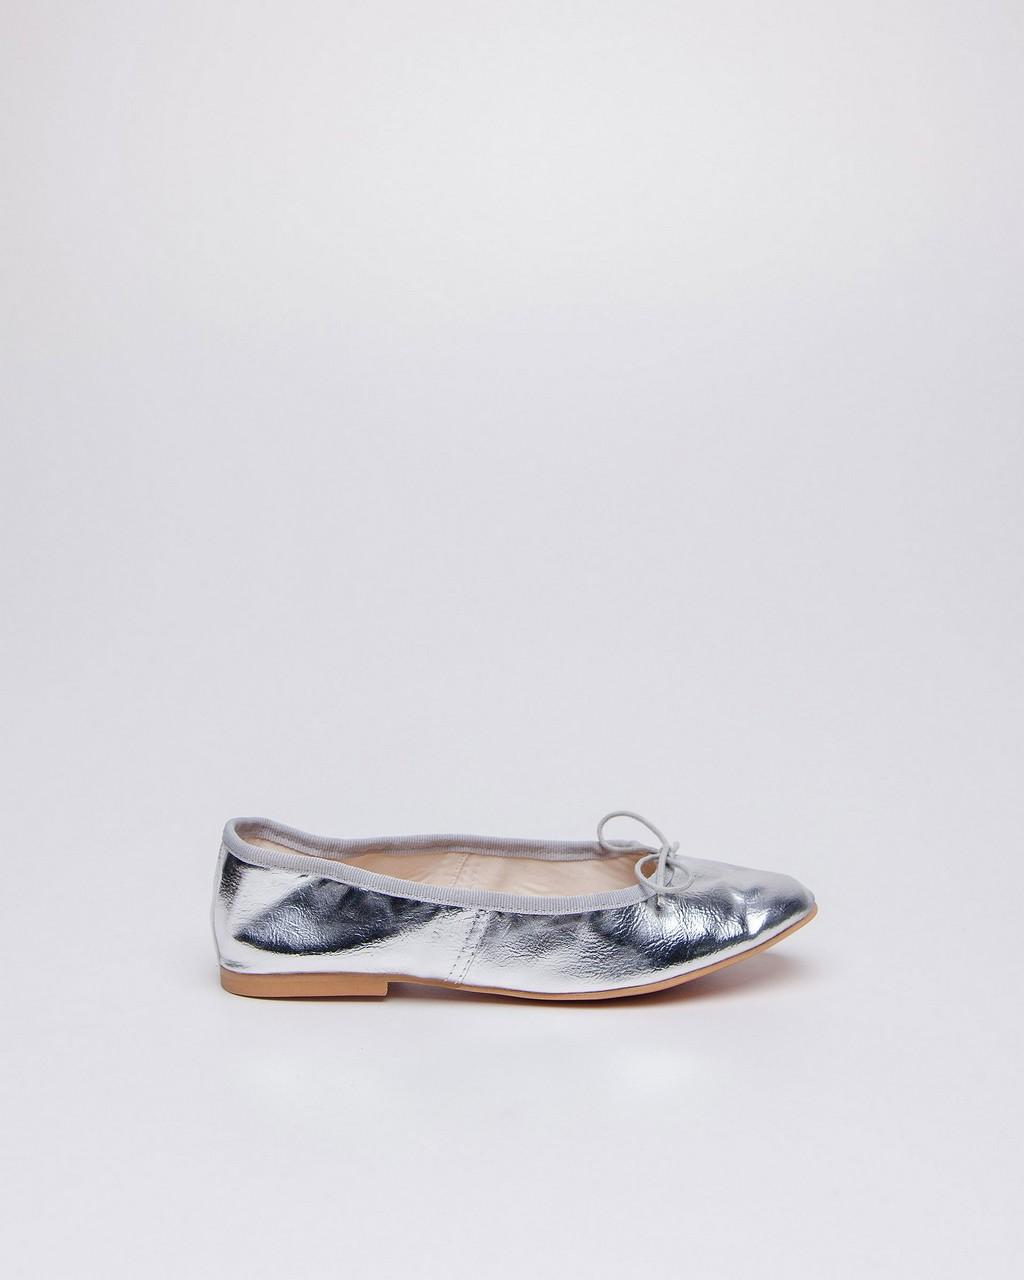 Tagtraume E.Ballerina-Spring - Silver(실버)